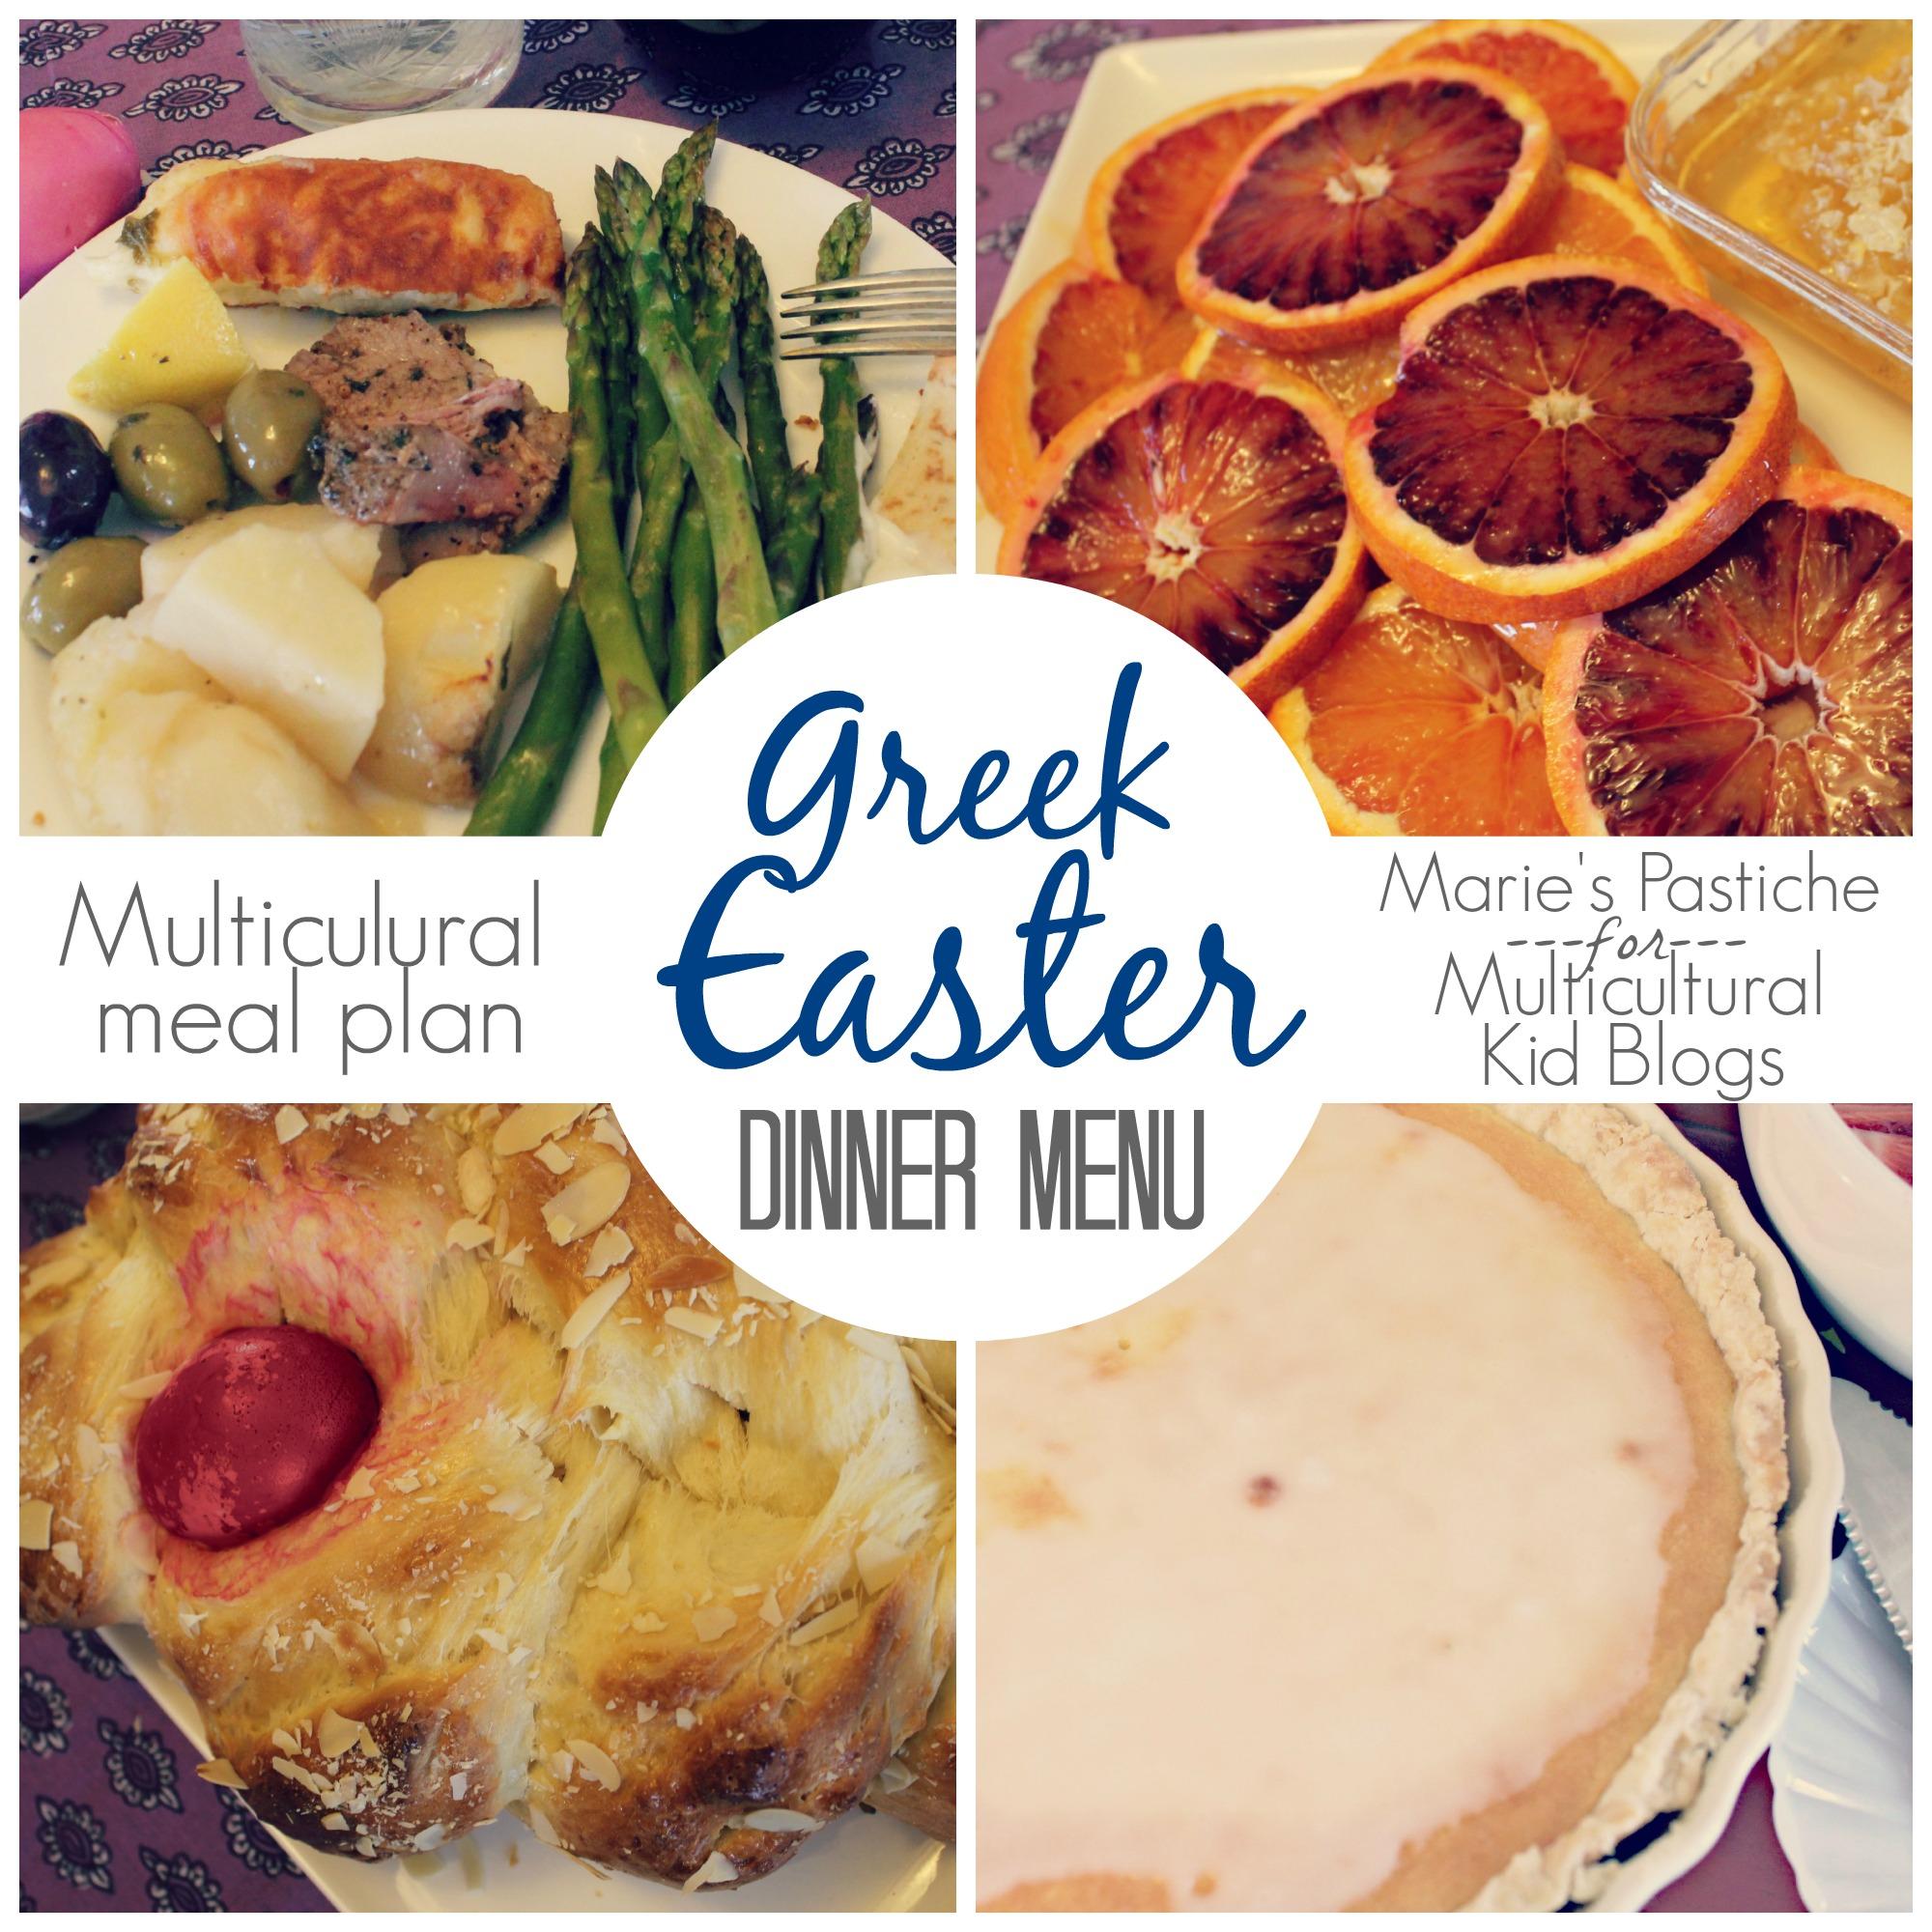 Greek Easter Dinner Menu: Multicultural Meal Plan {Marie's Pastiche}